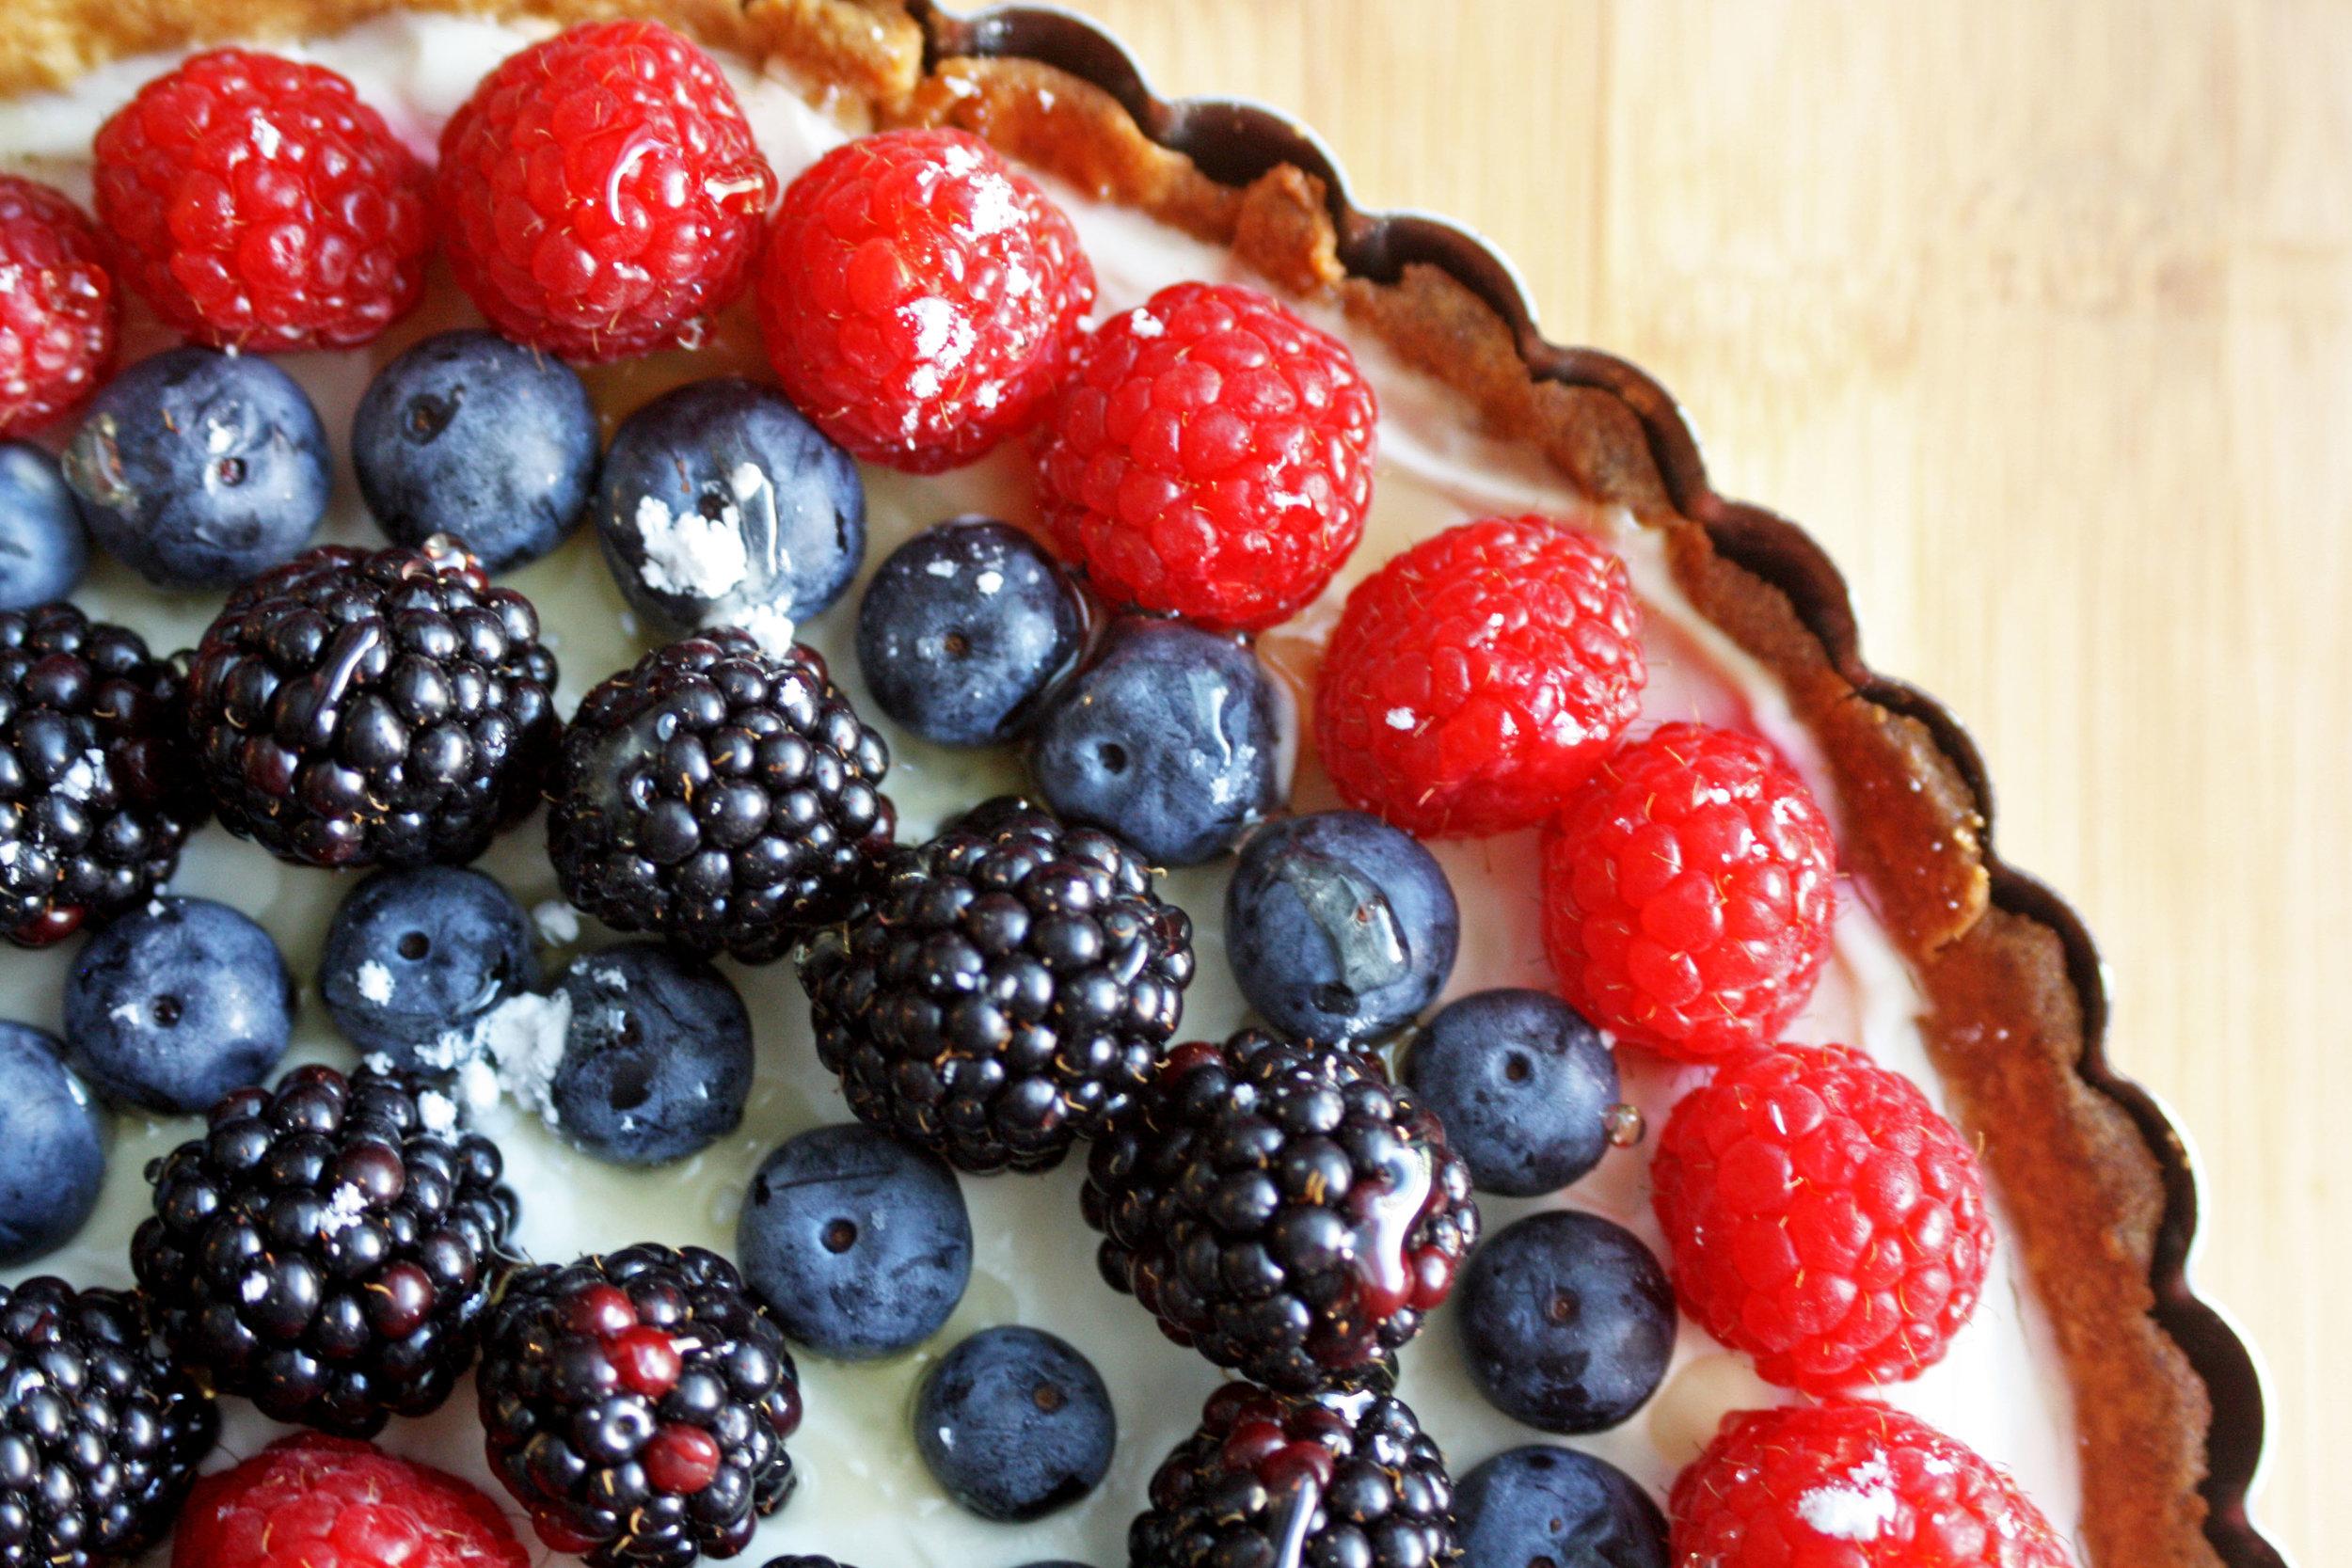 berrycheesecaketart2.jpg